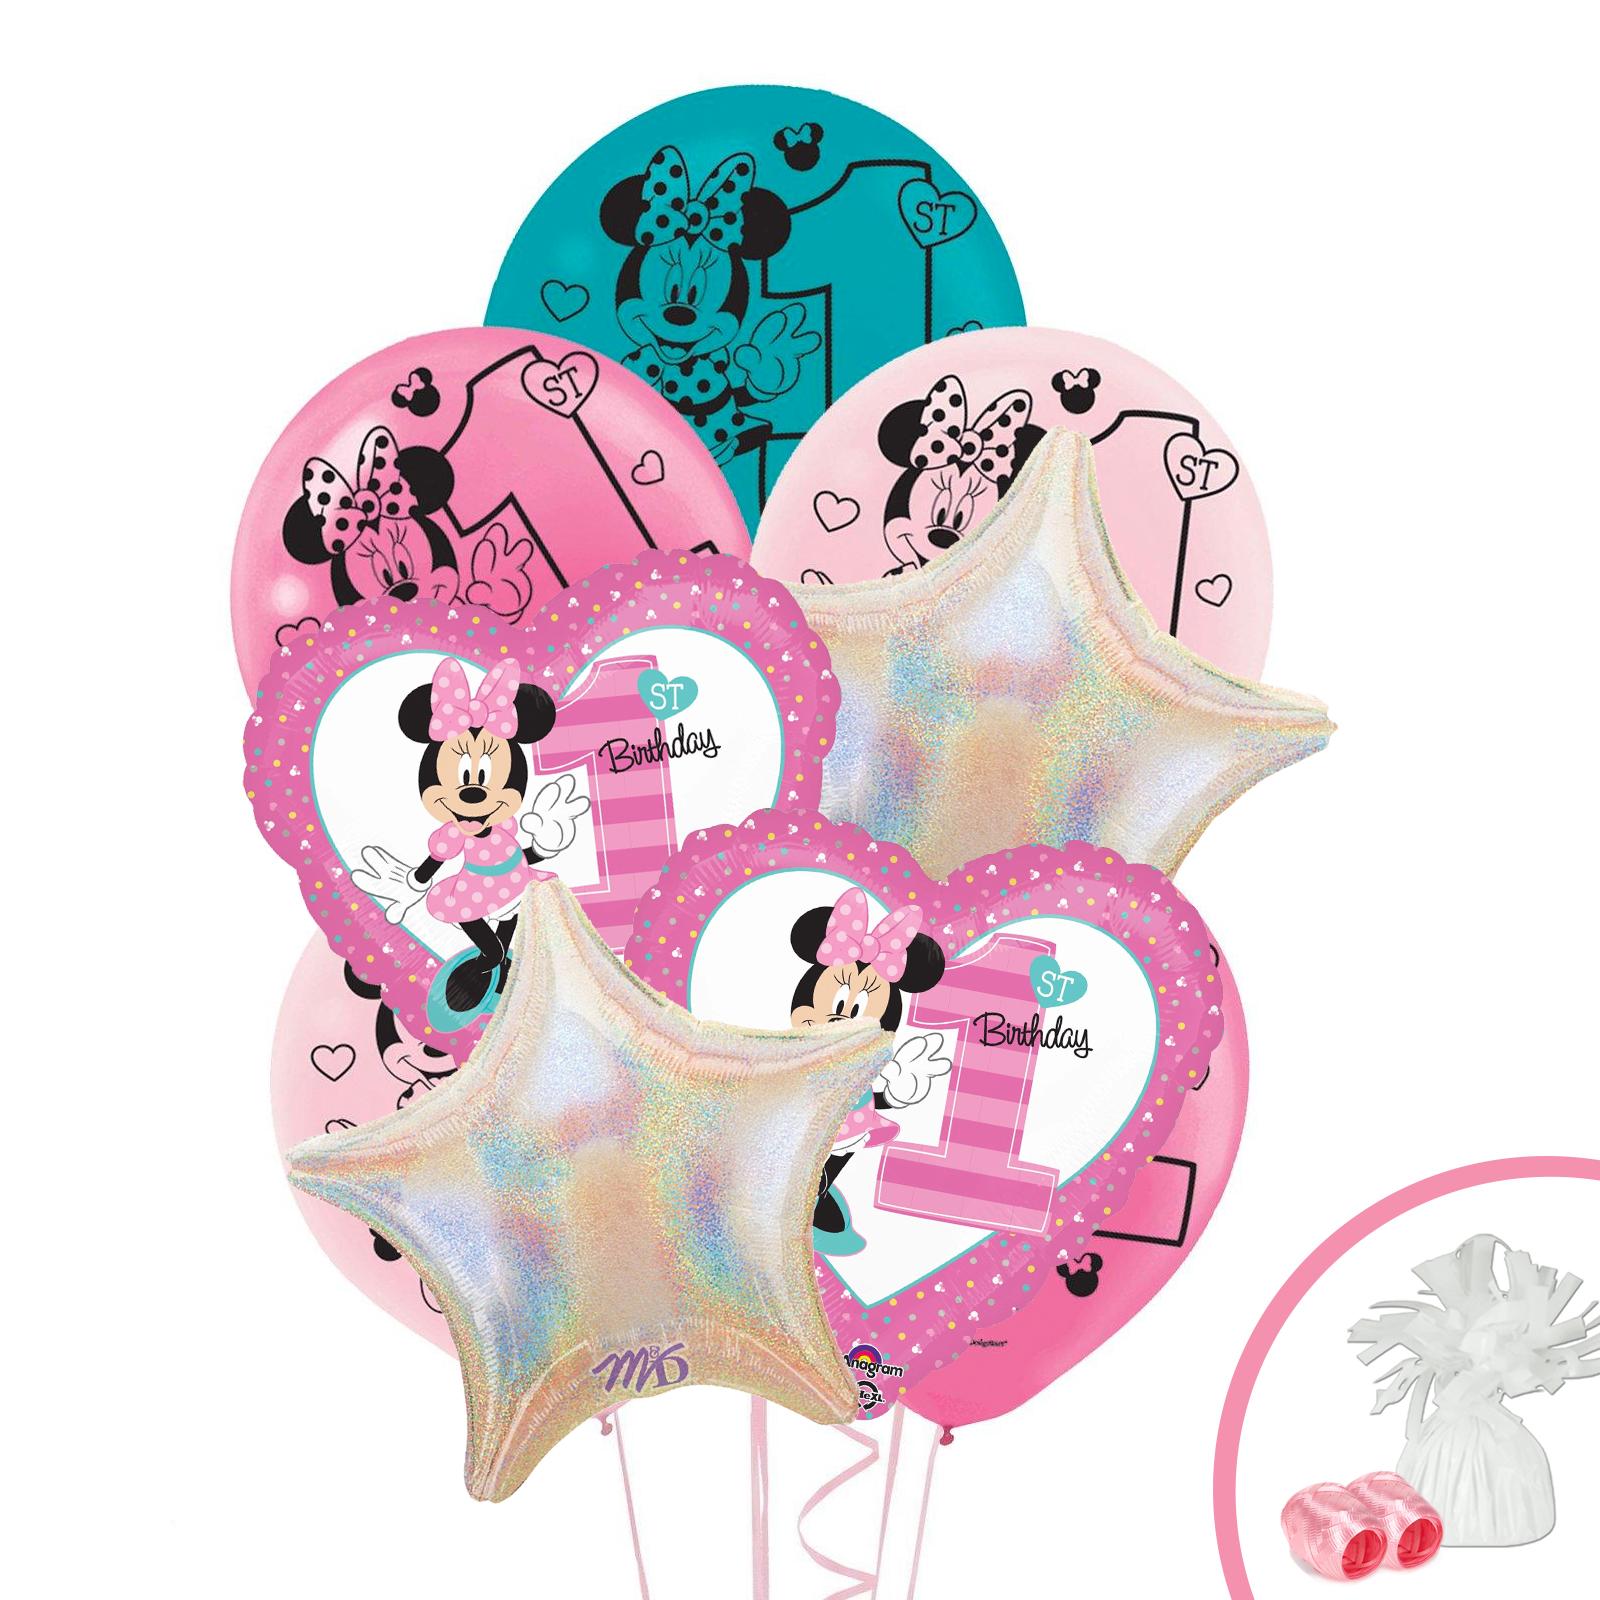 Disney Minnie Mouse 1st Birthday Balloon Bouquet BirthdayExpresscom